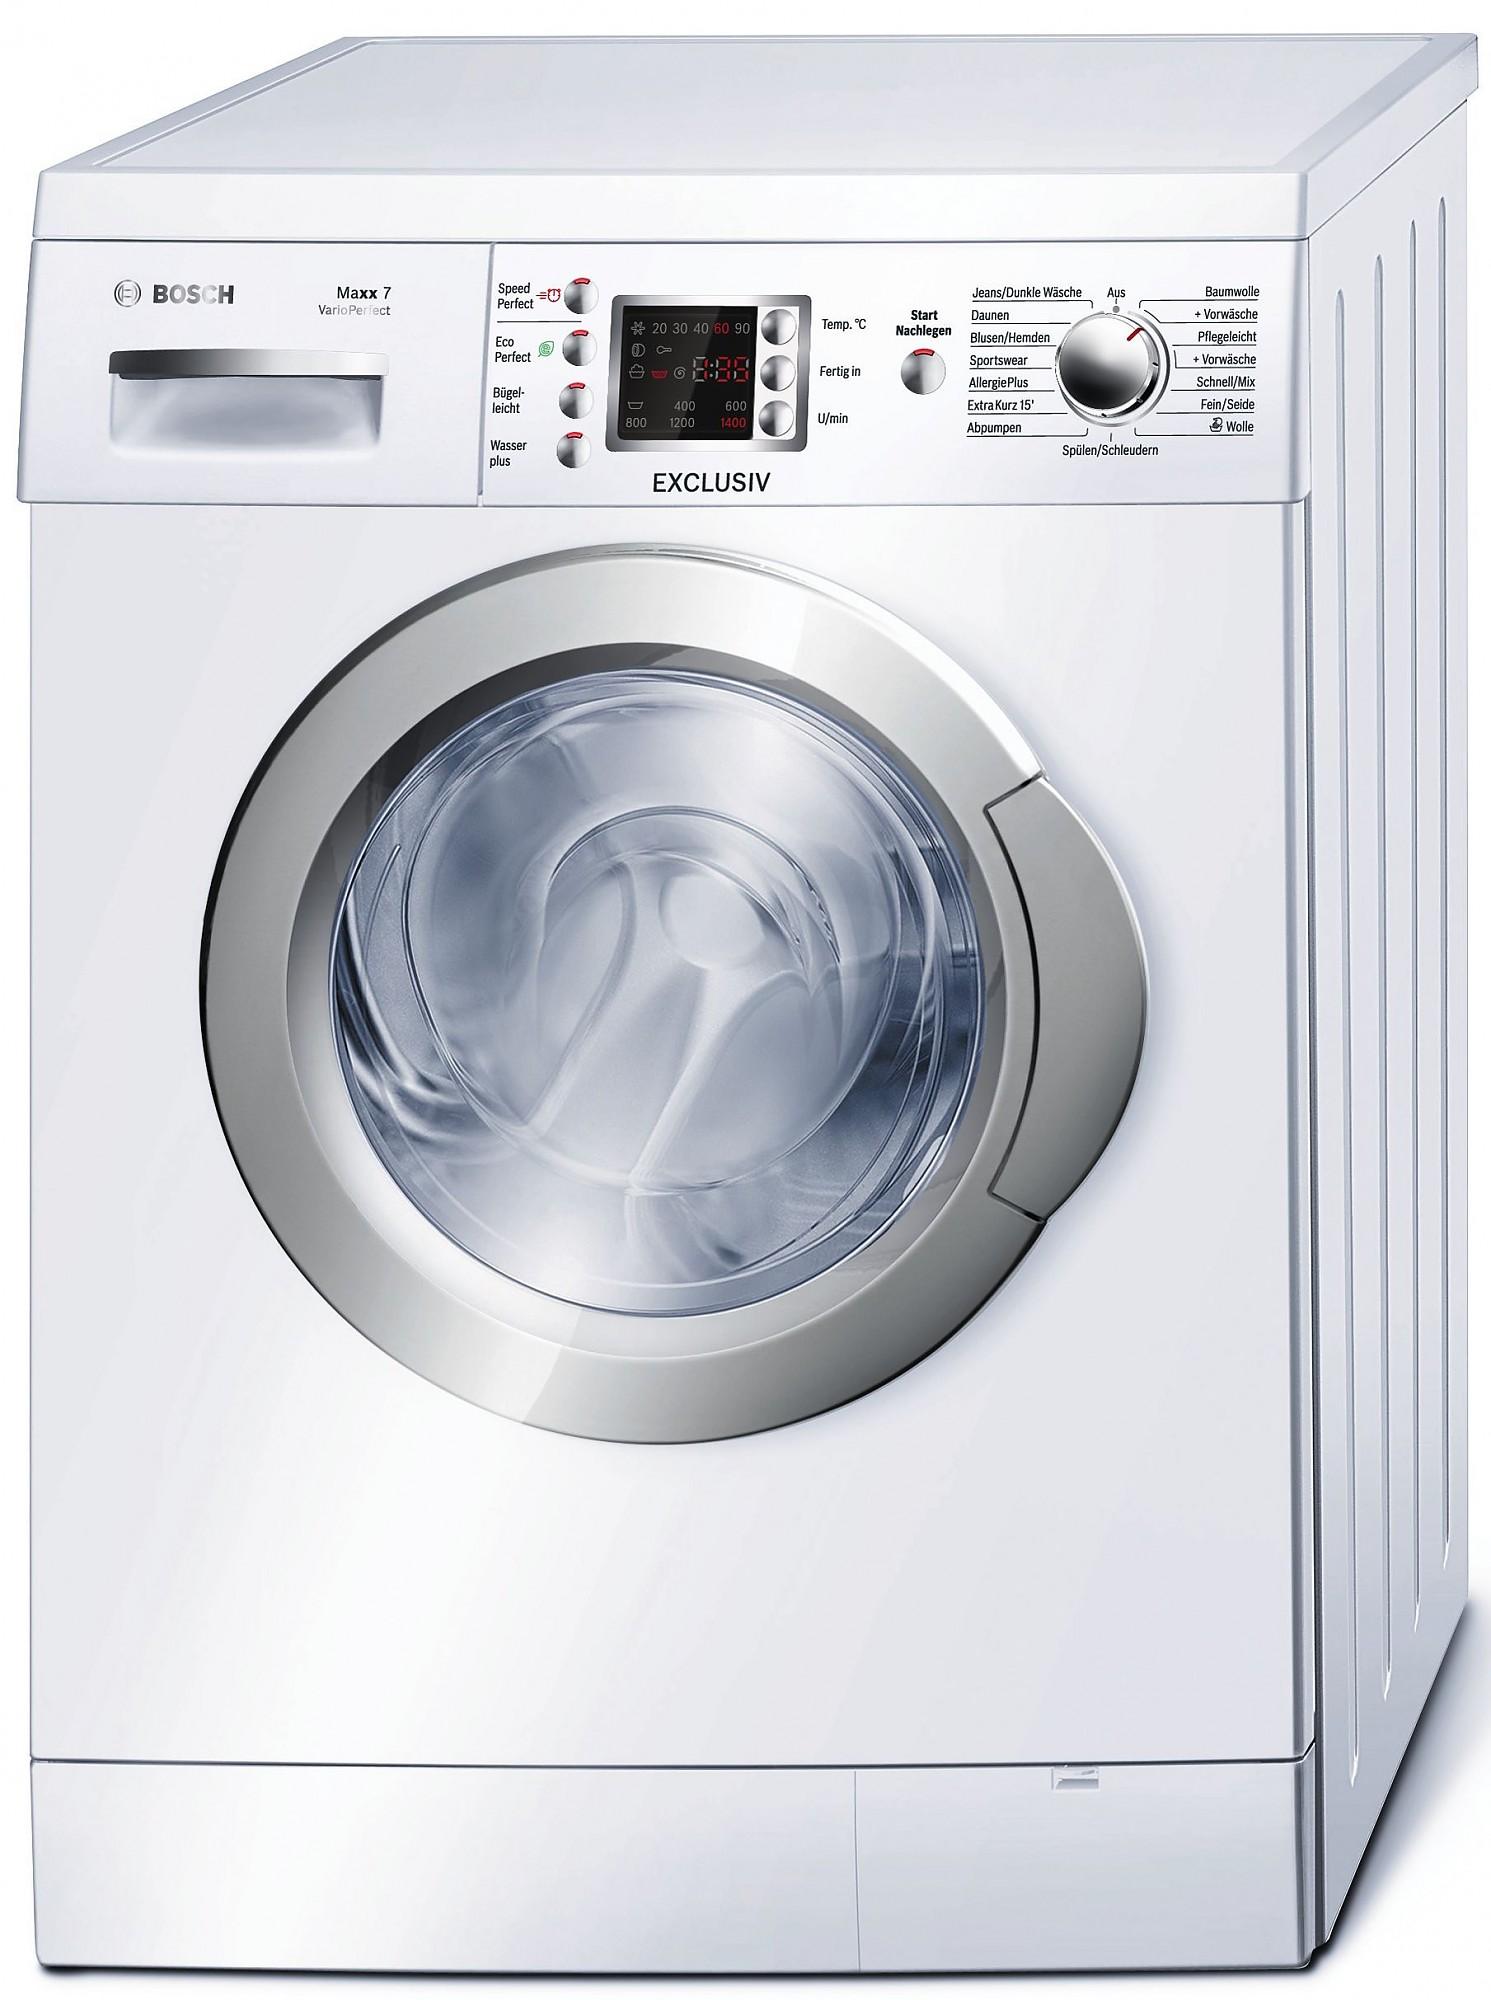 wae28496 maxx 7 varioperfect weiss bosch elektro gro exclusiv stand waschmaschinen. Black Bedroom Furniture Sets. Home Design Ideas